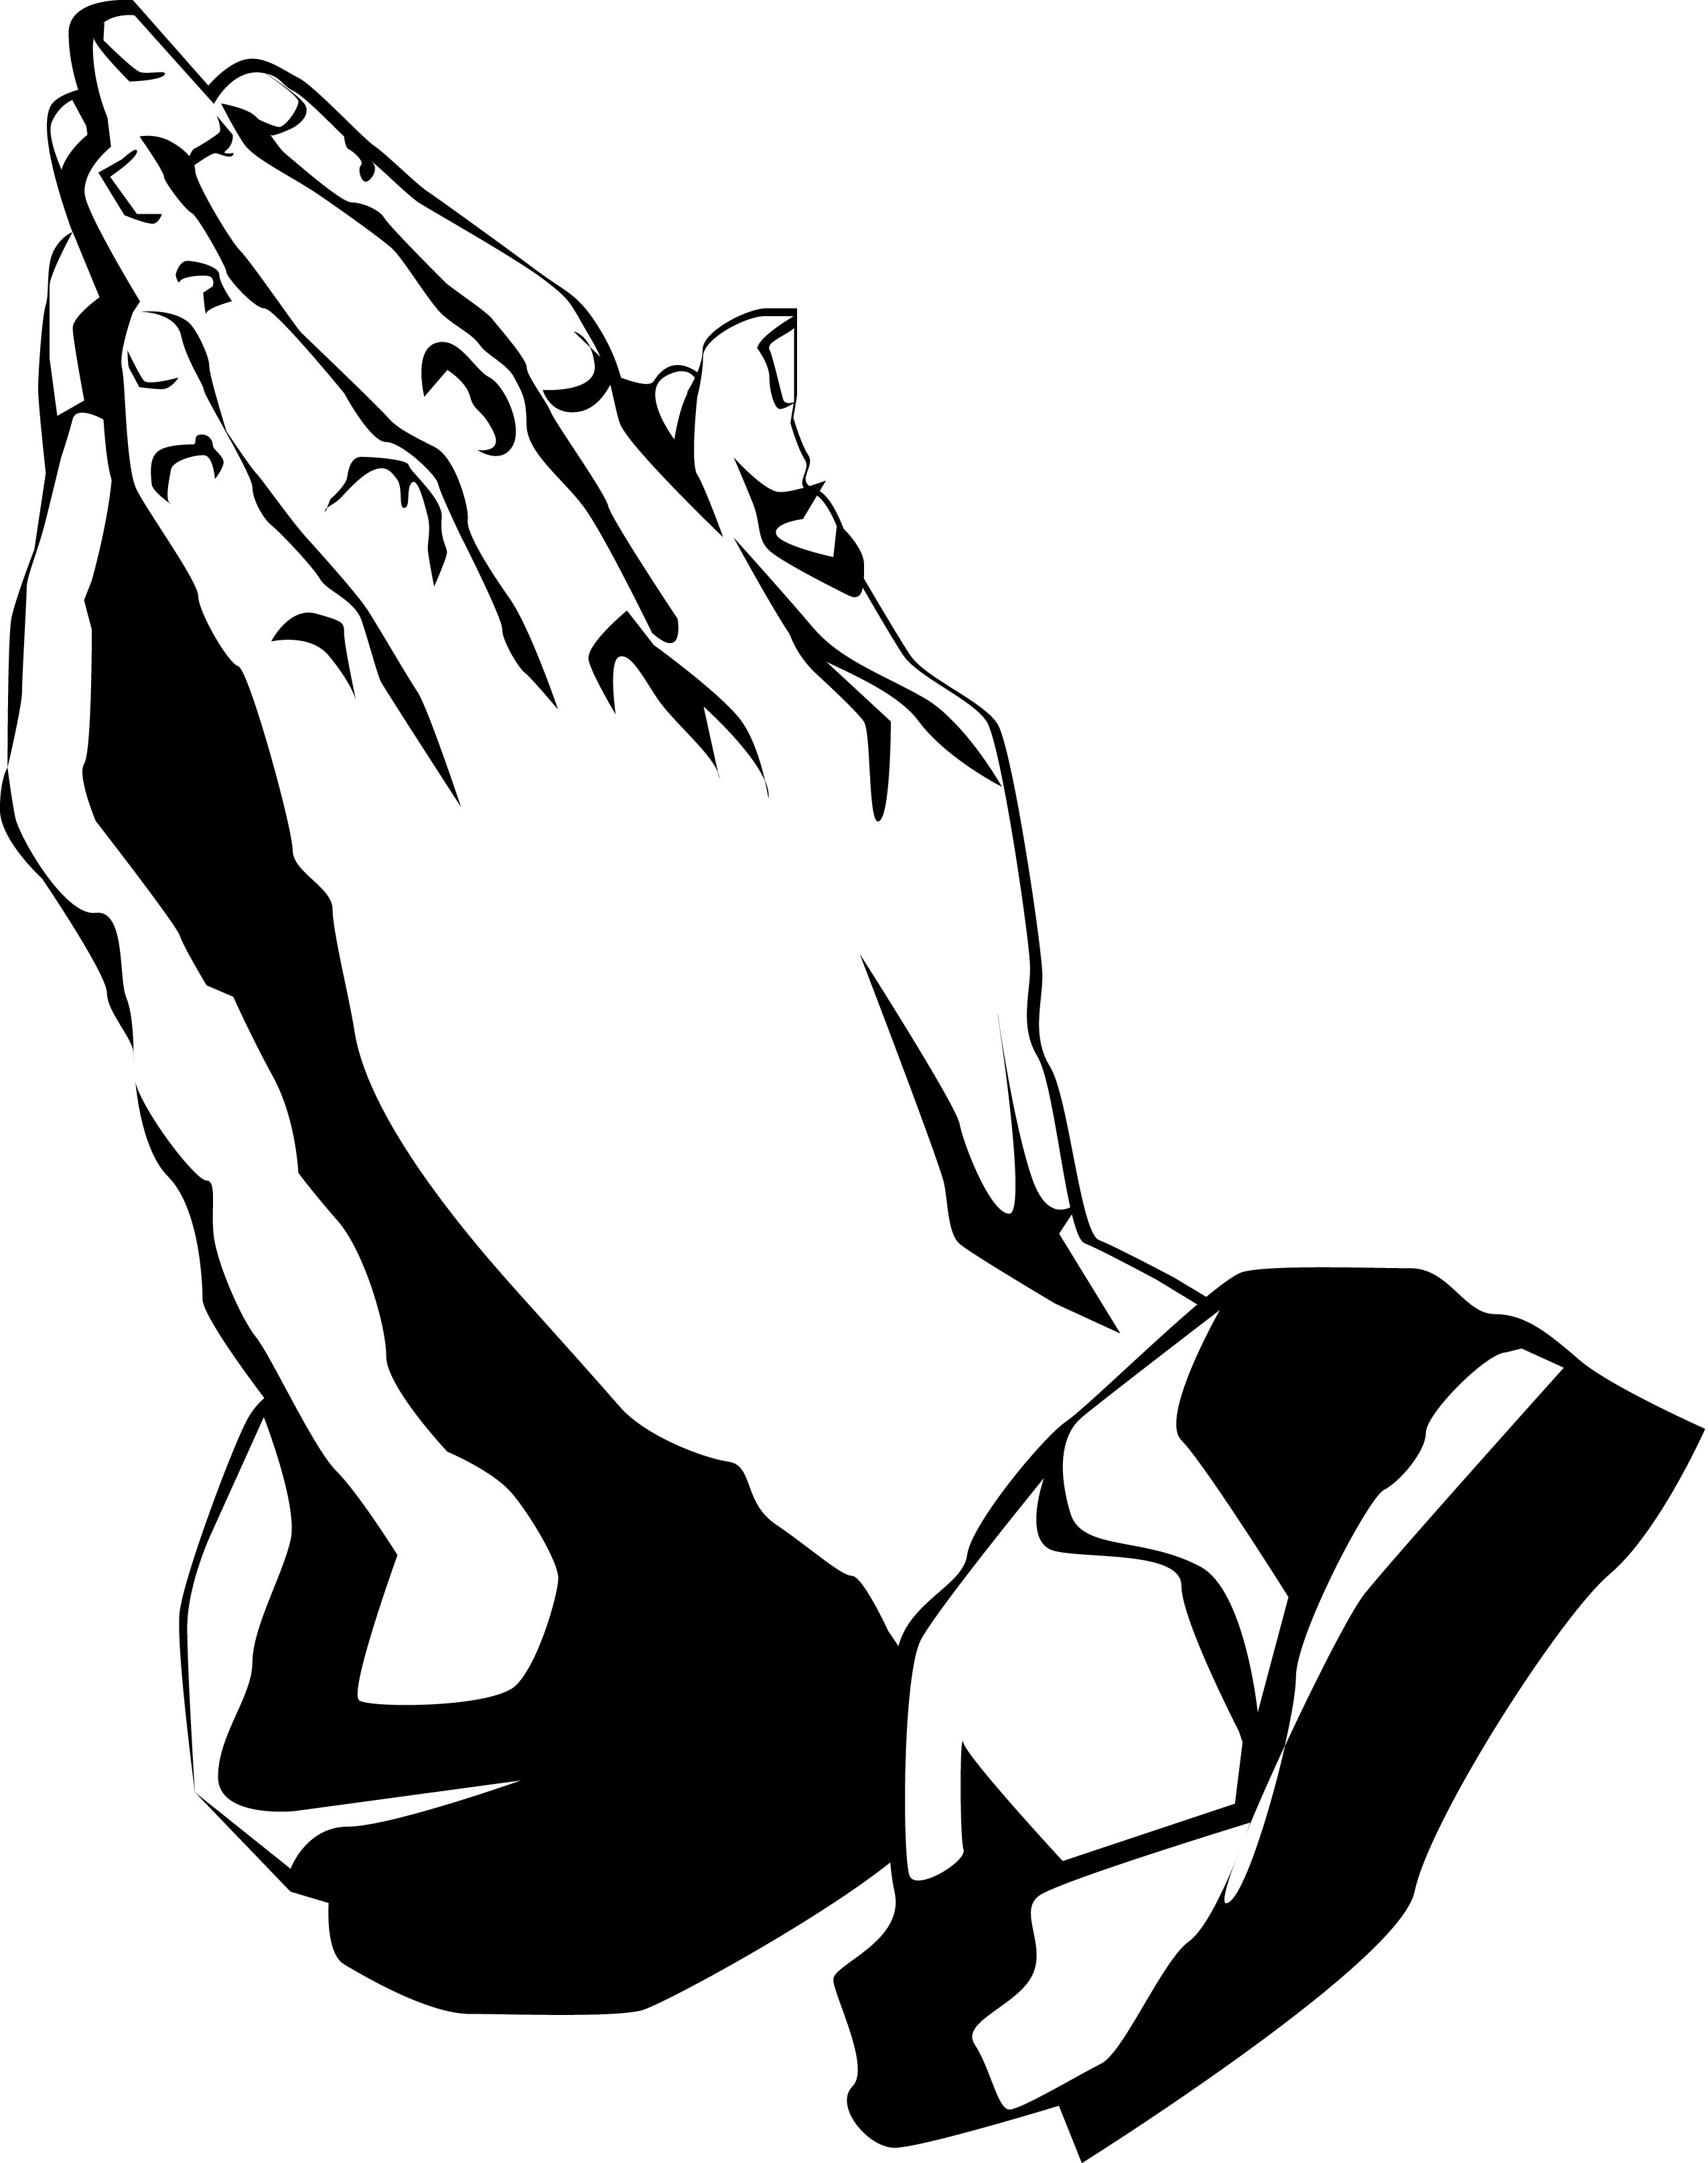 2550x3229 Hand Clipart Jesus